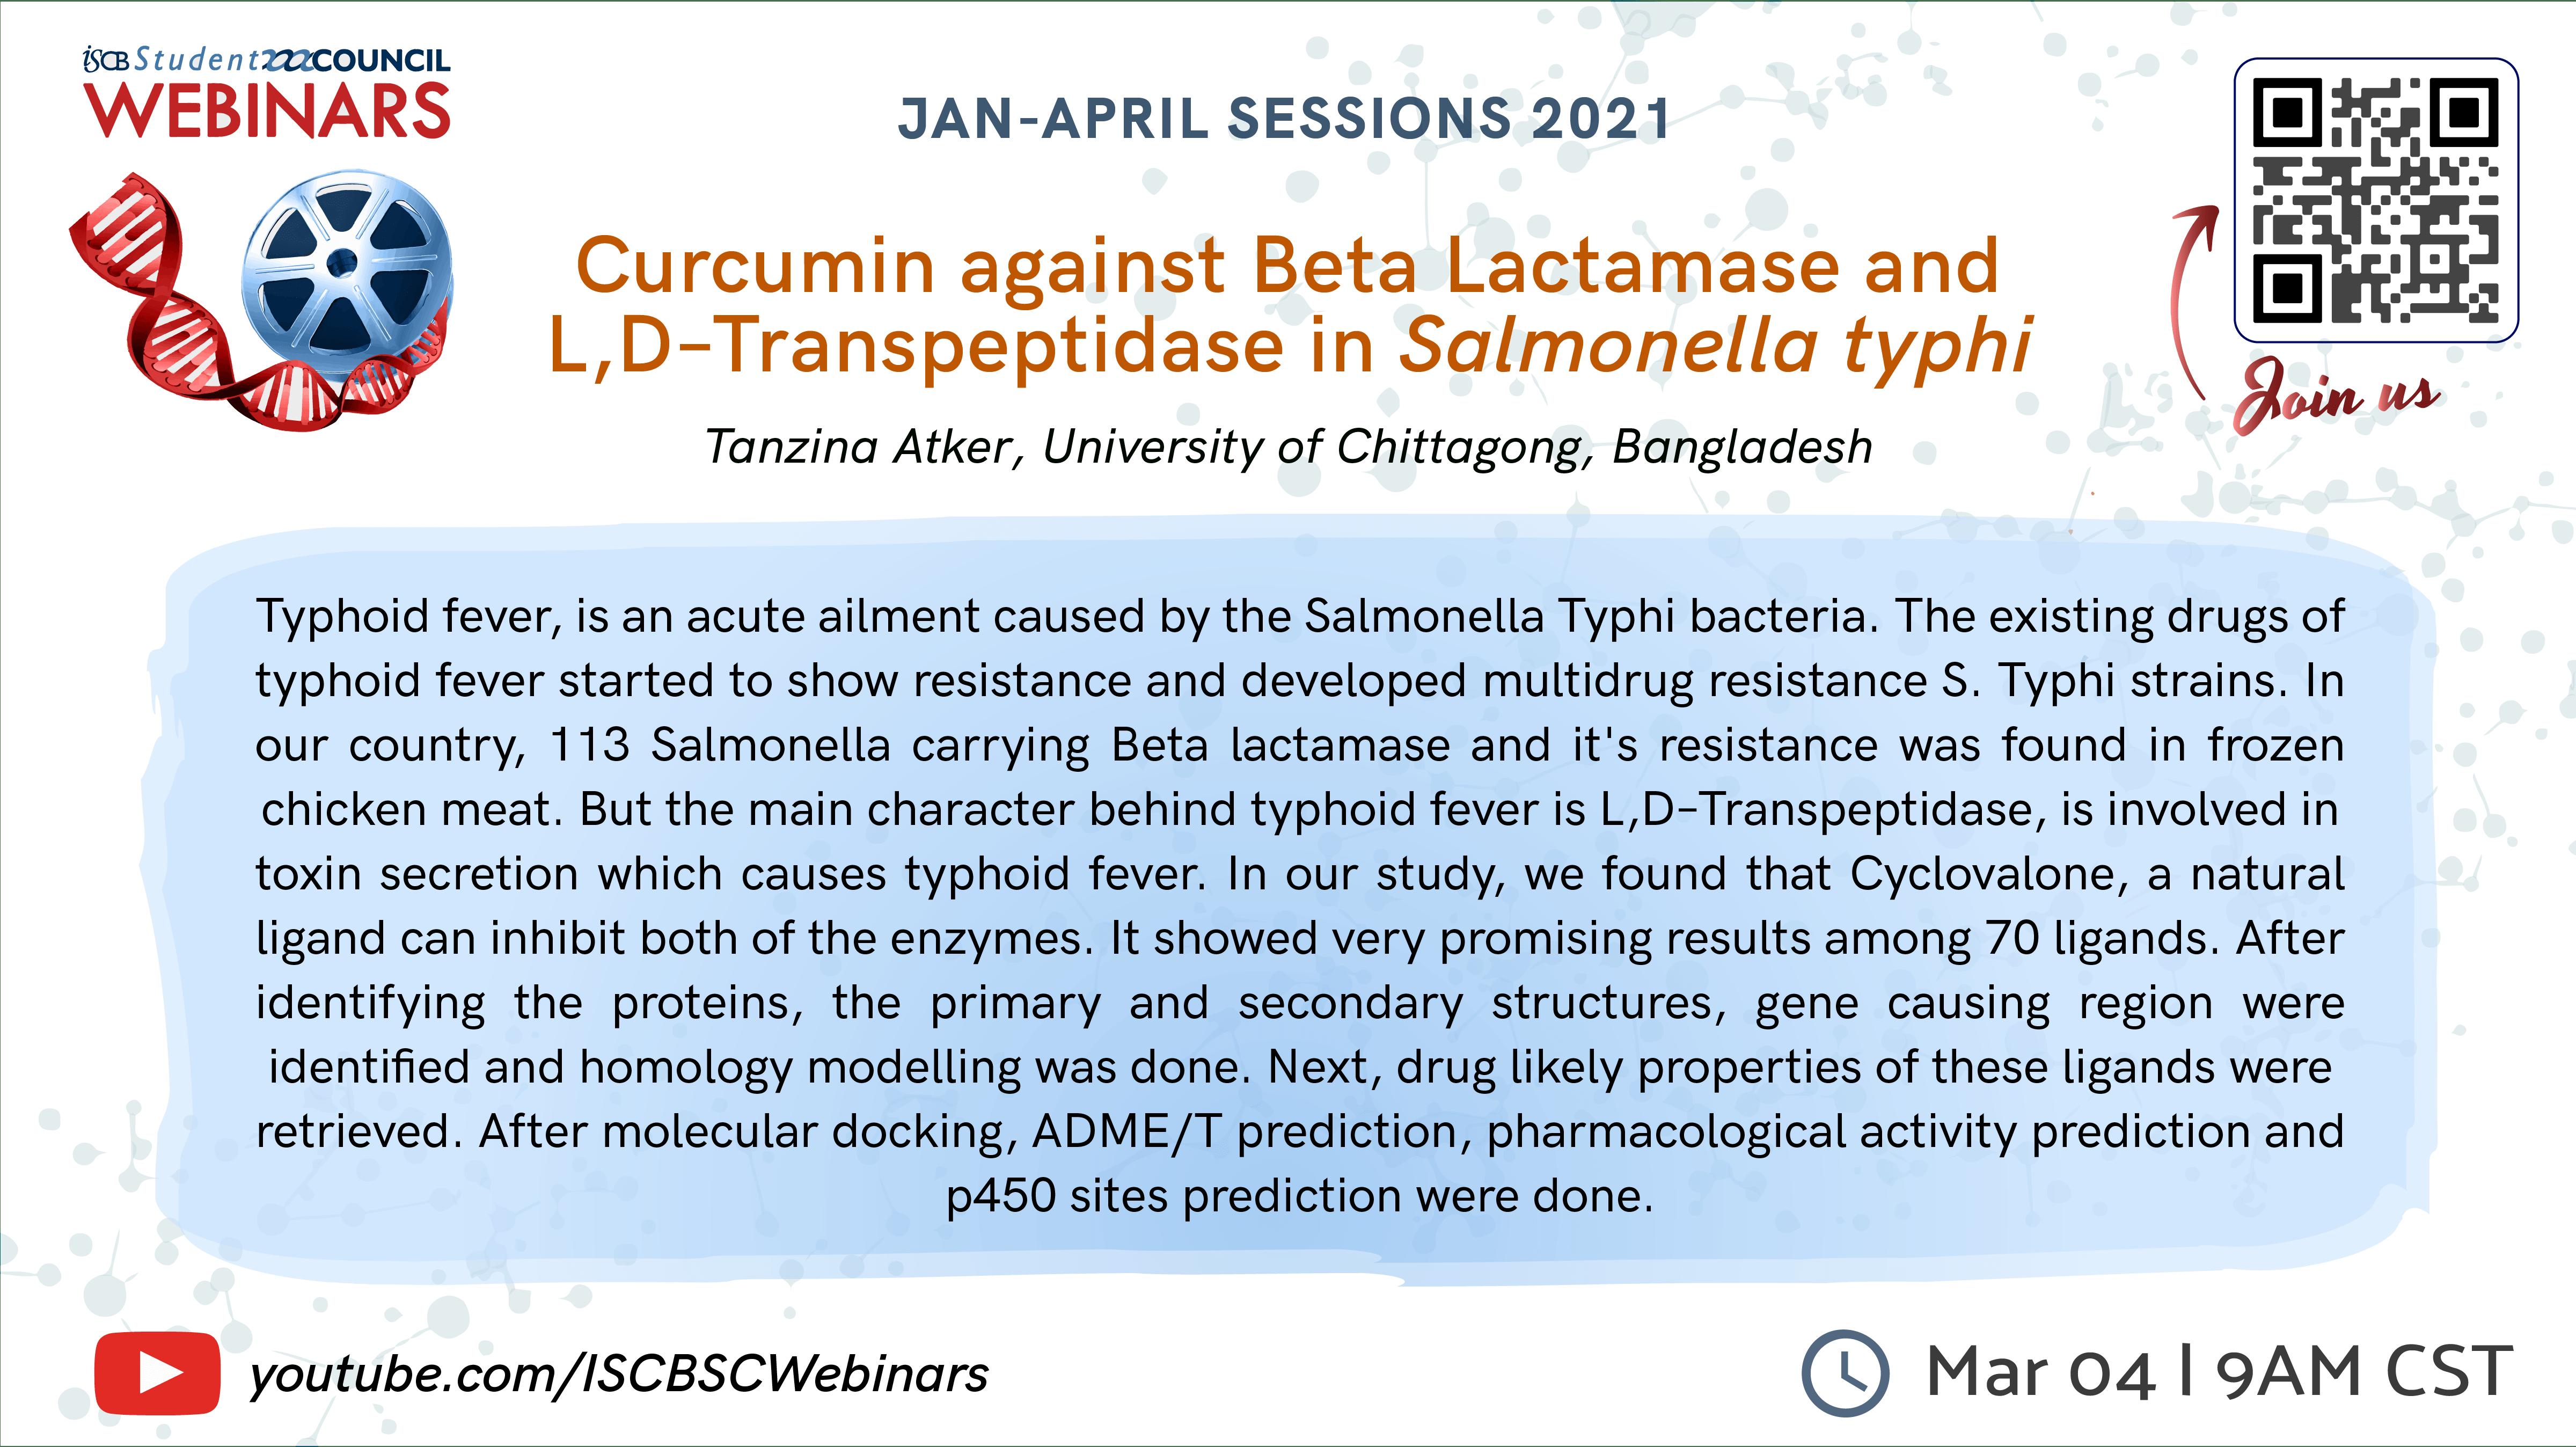 Tanzina Atker: Curcumin against Beta Lactamase and L,D–Transpeptidase in Salmonella typhi